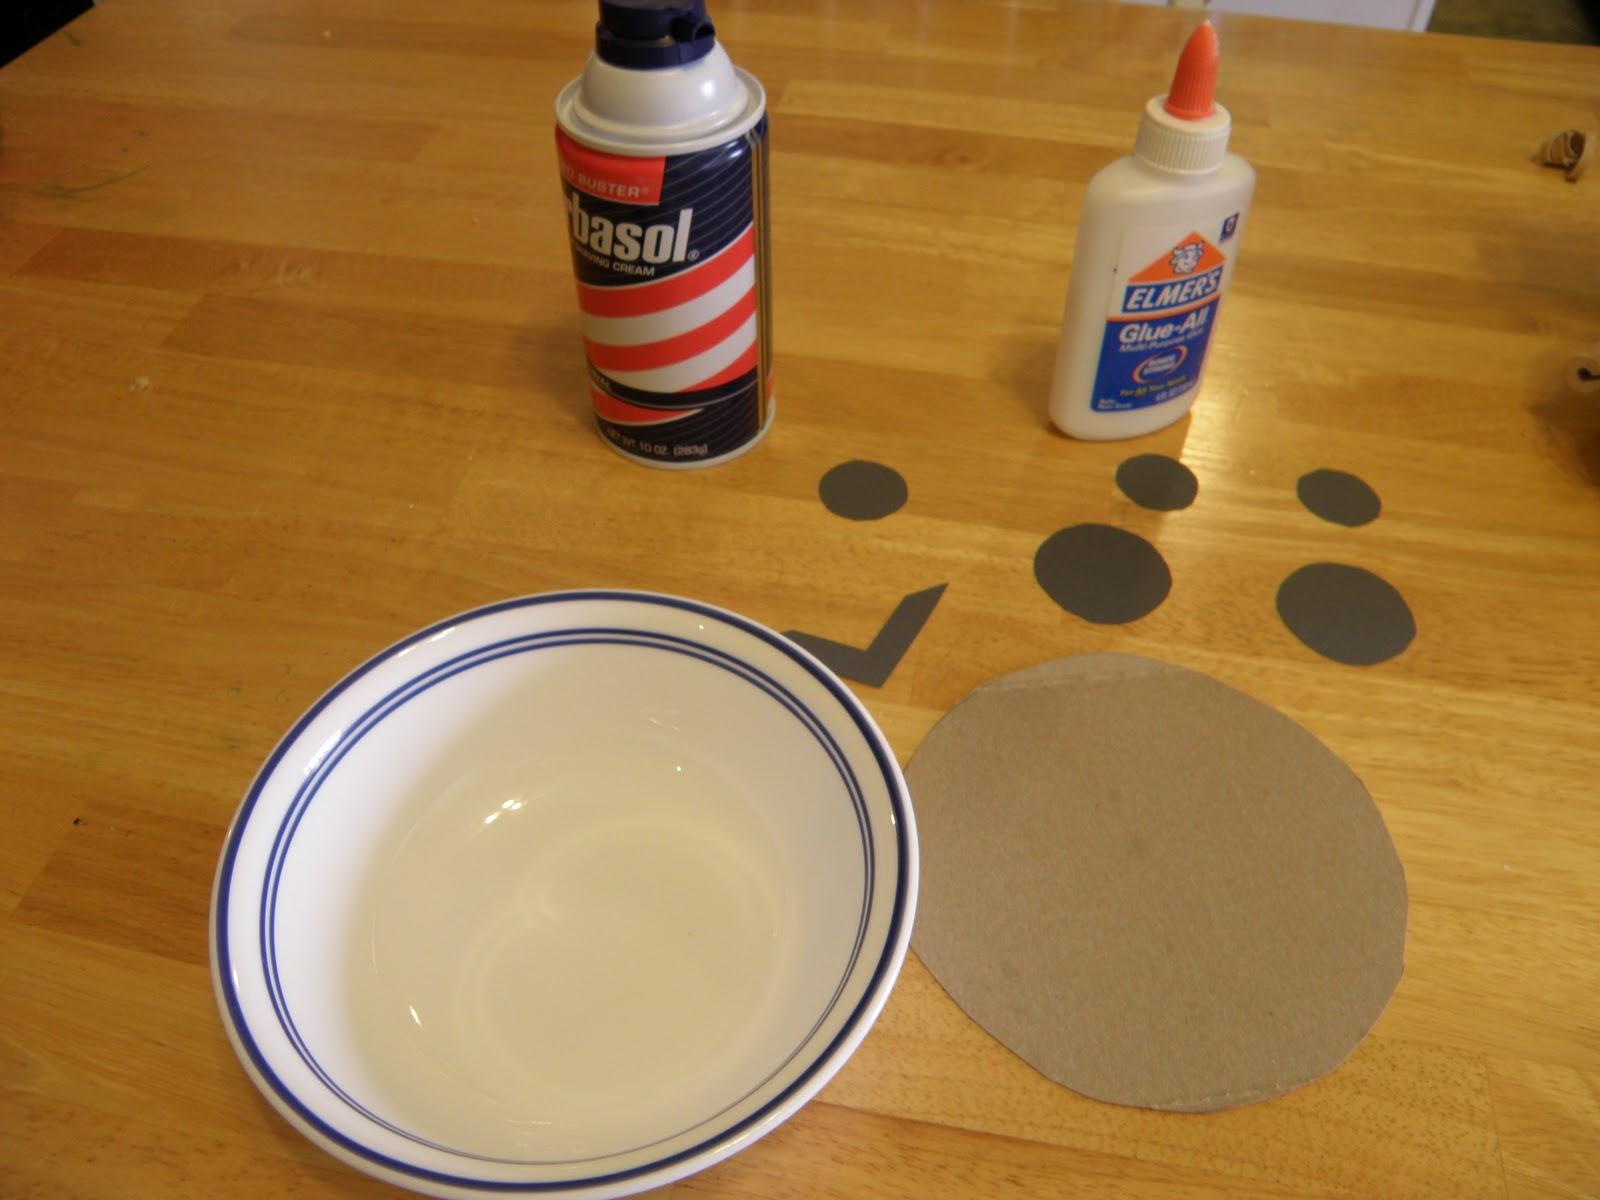 Polar Bear Crafts For Preschoolers New Year Craft For Kindergarten